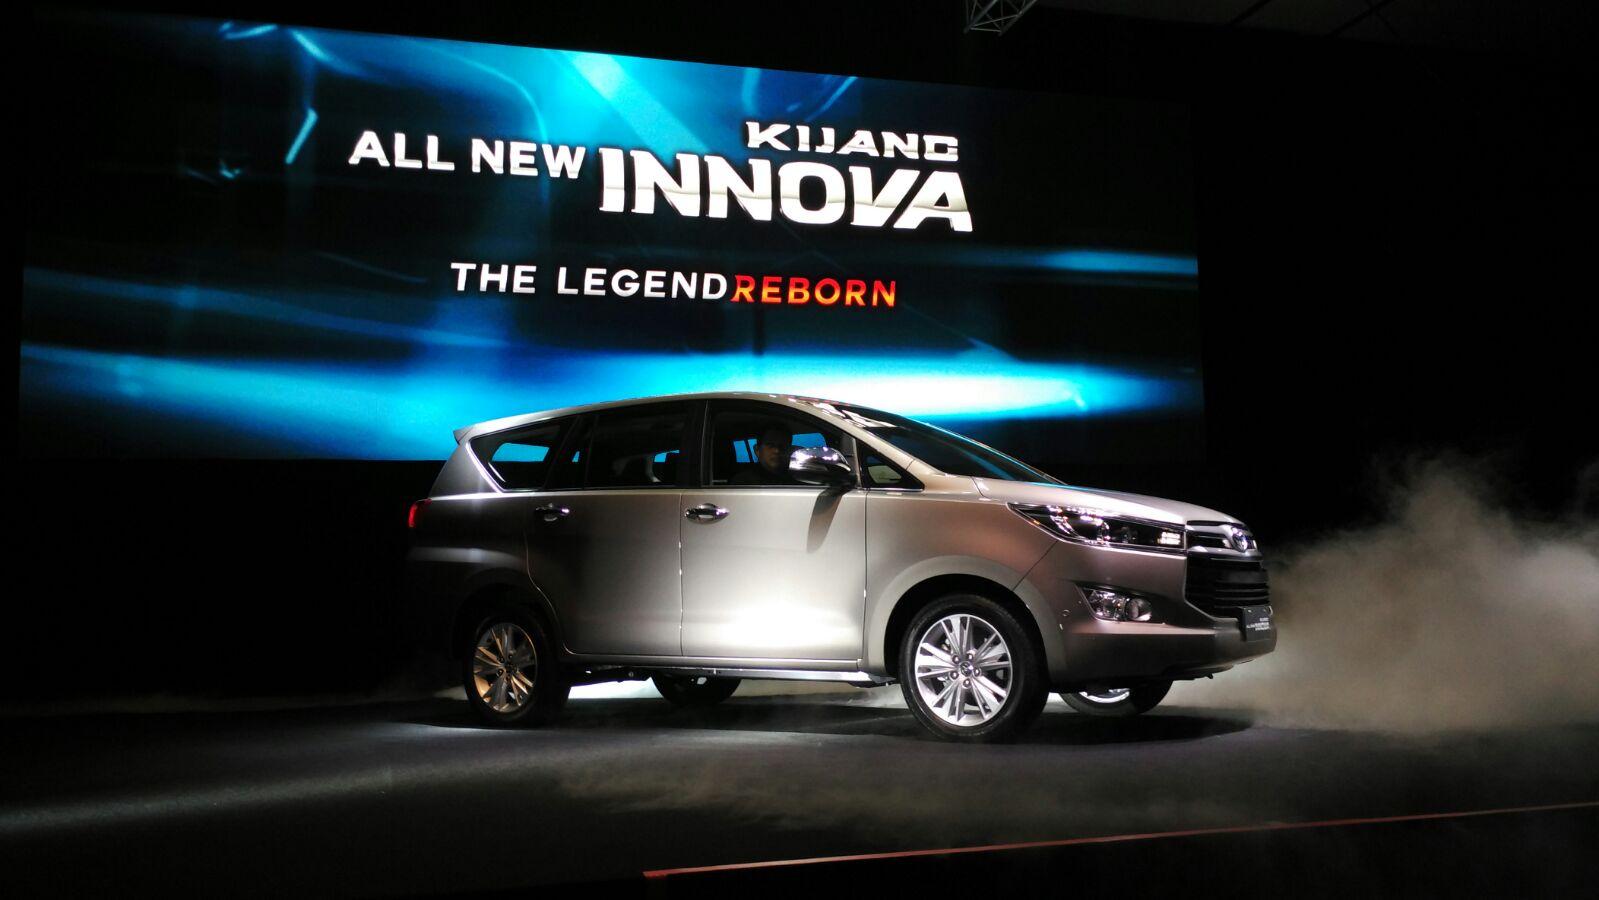 New Toyota Kijang Inova 2016 | newhairstylesformen2014.com